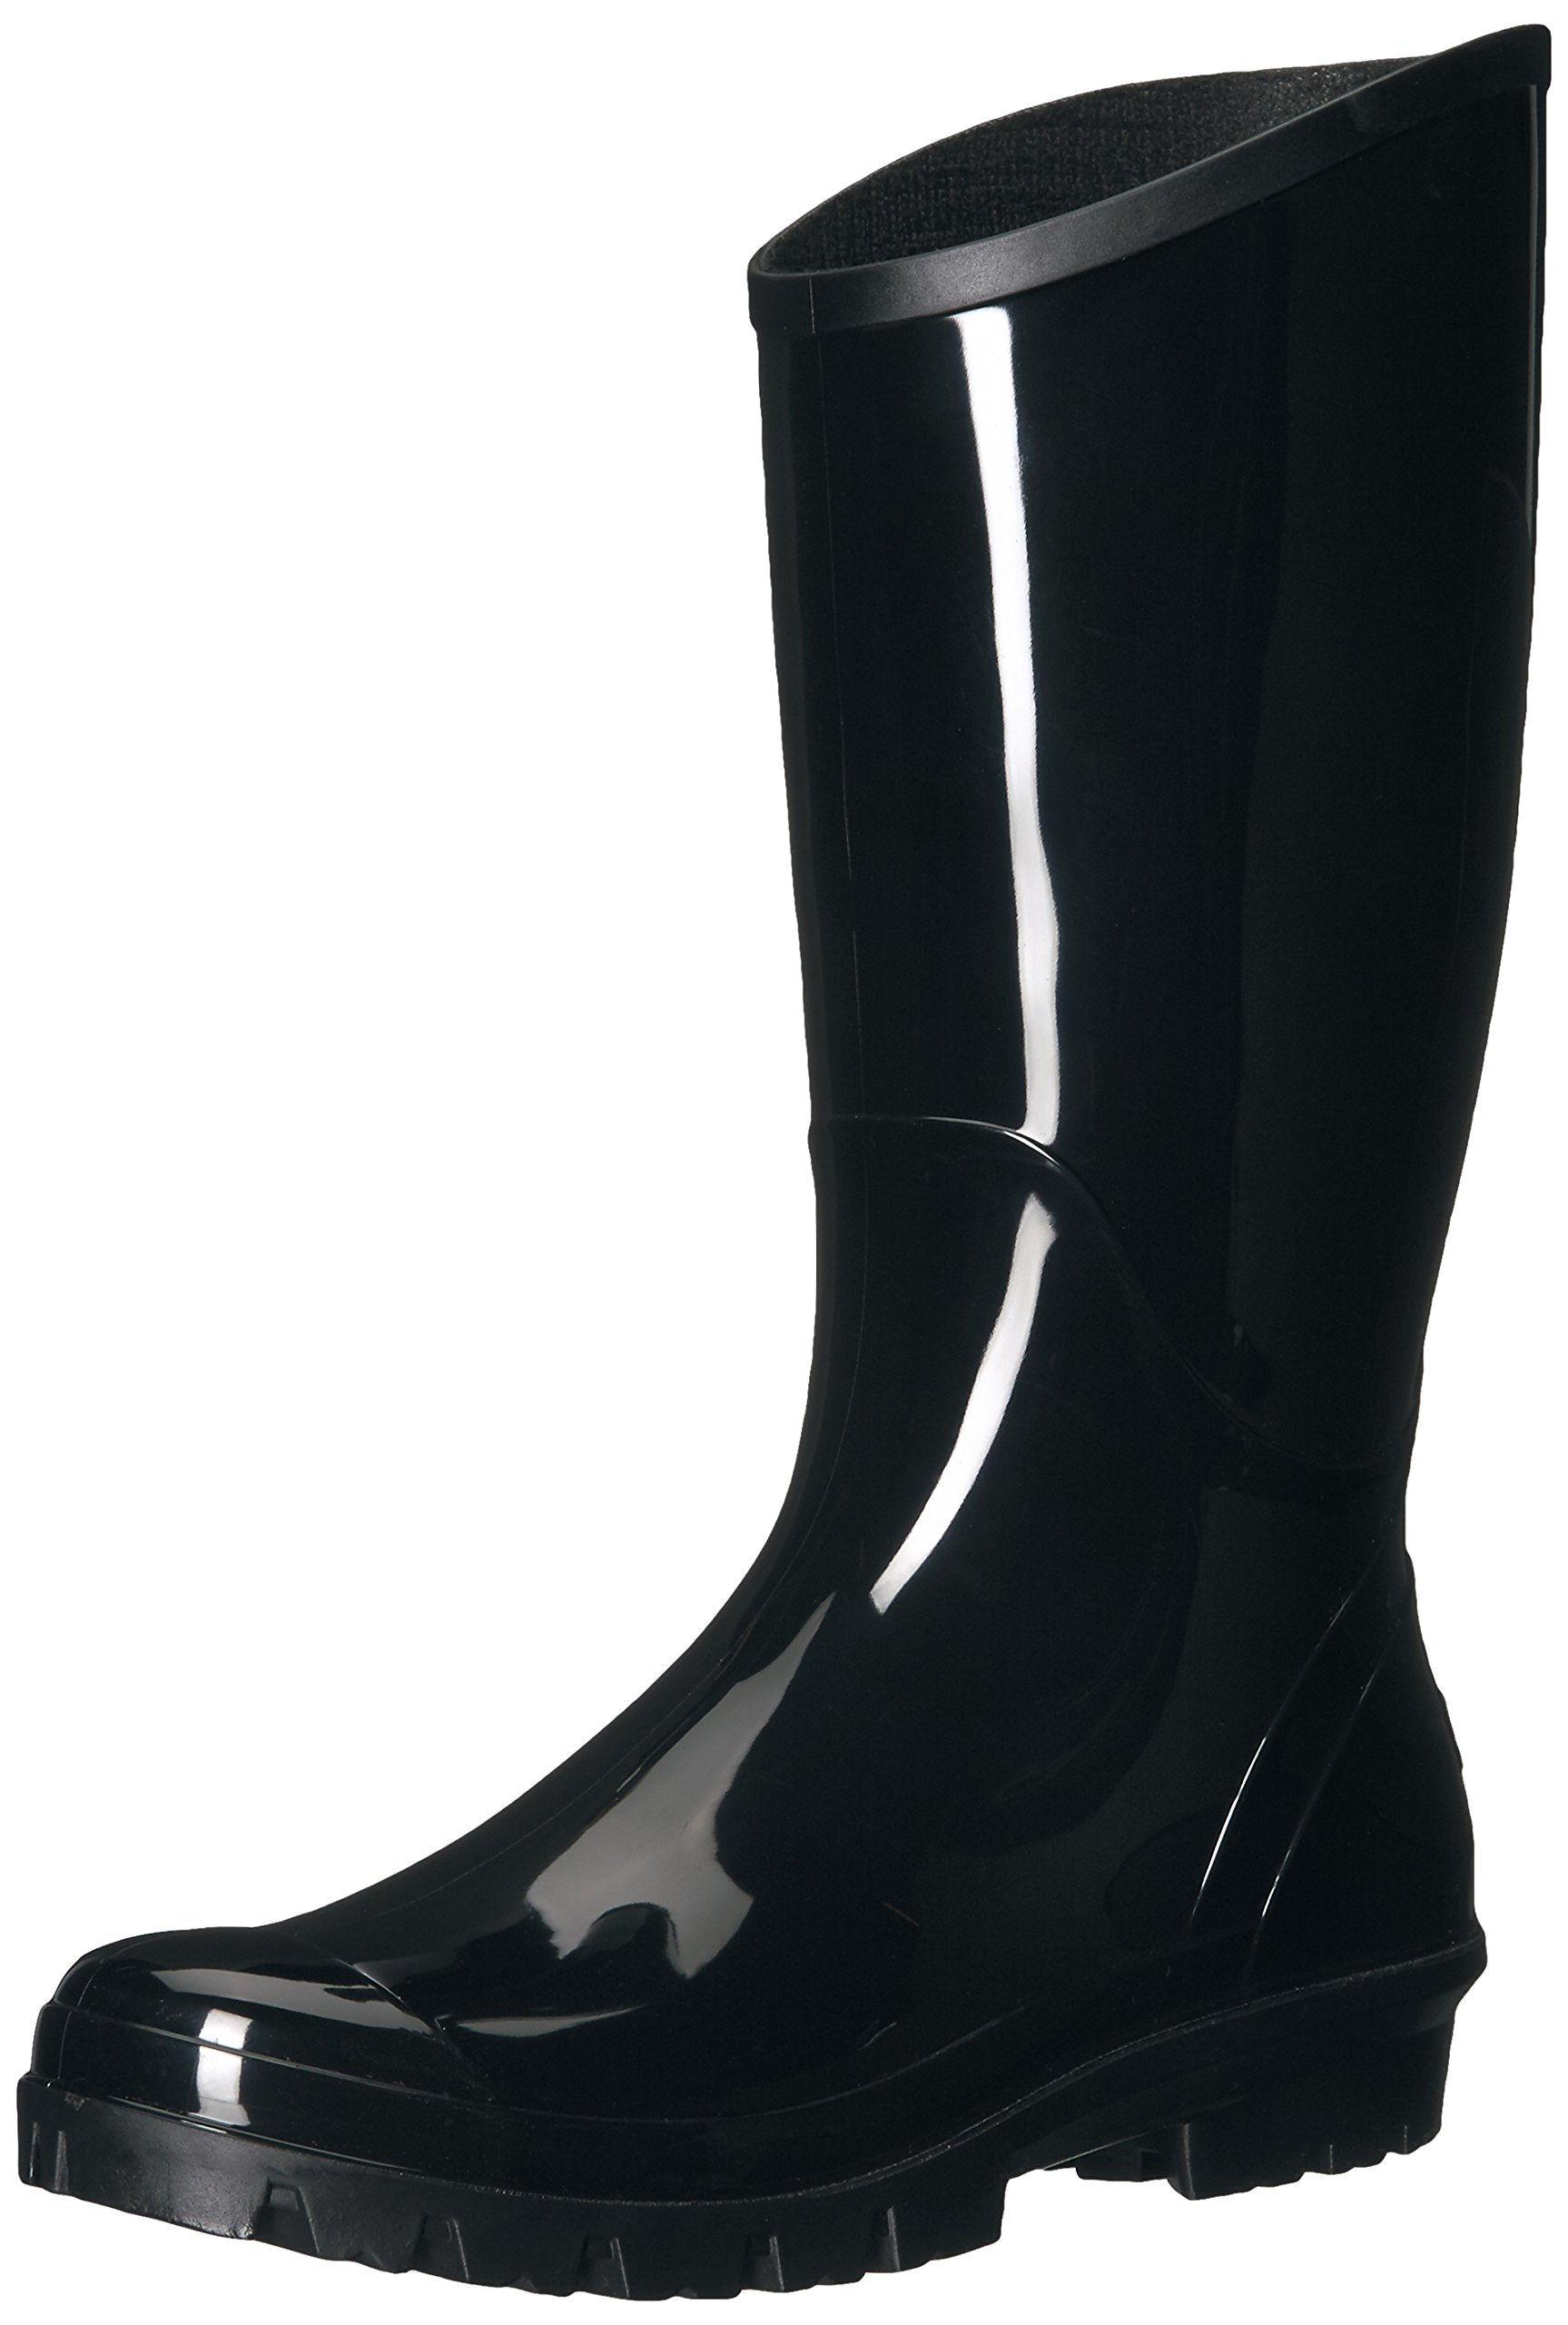 Columbia Women's Rainey Tall Rain Boot, Black, Monument, 7 B US